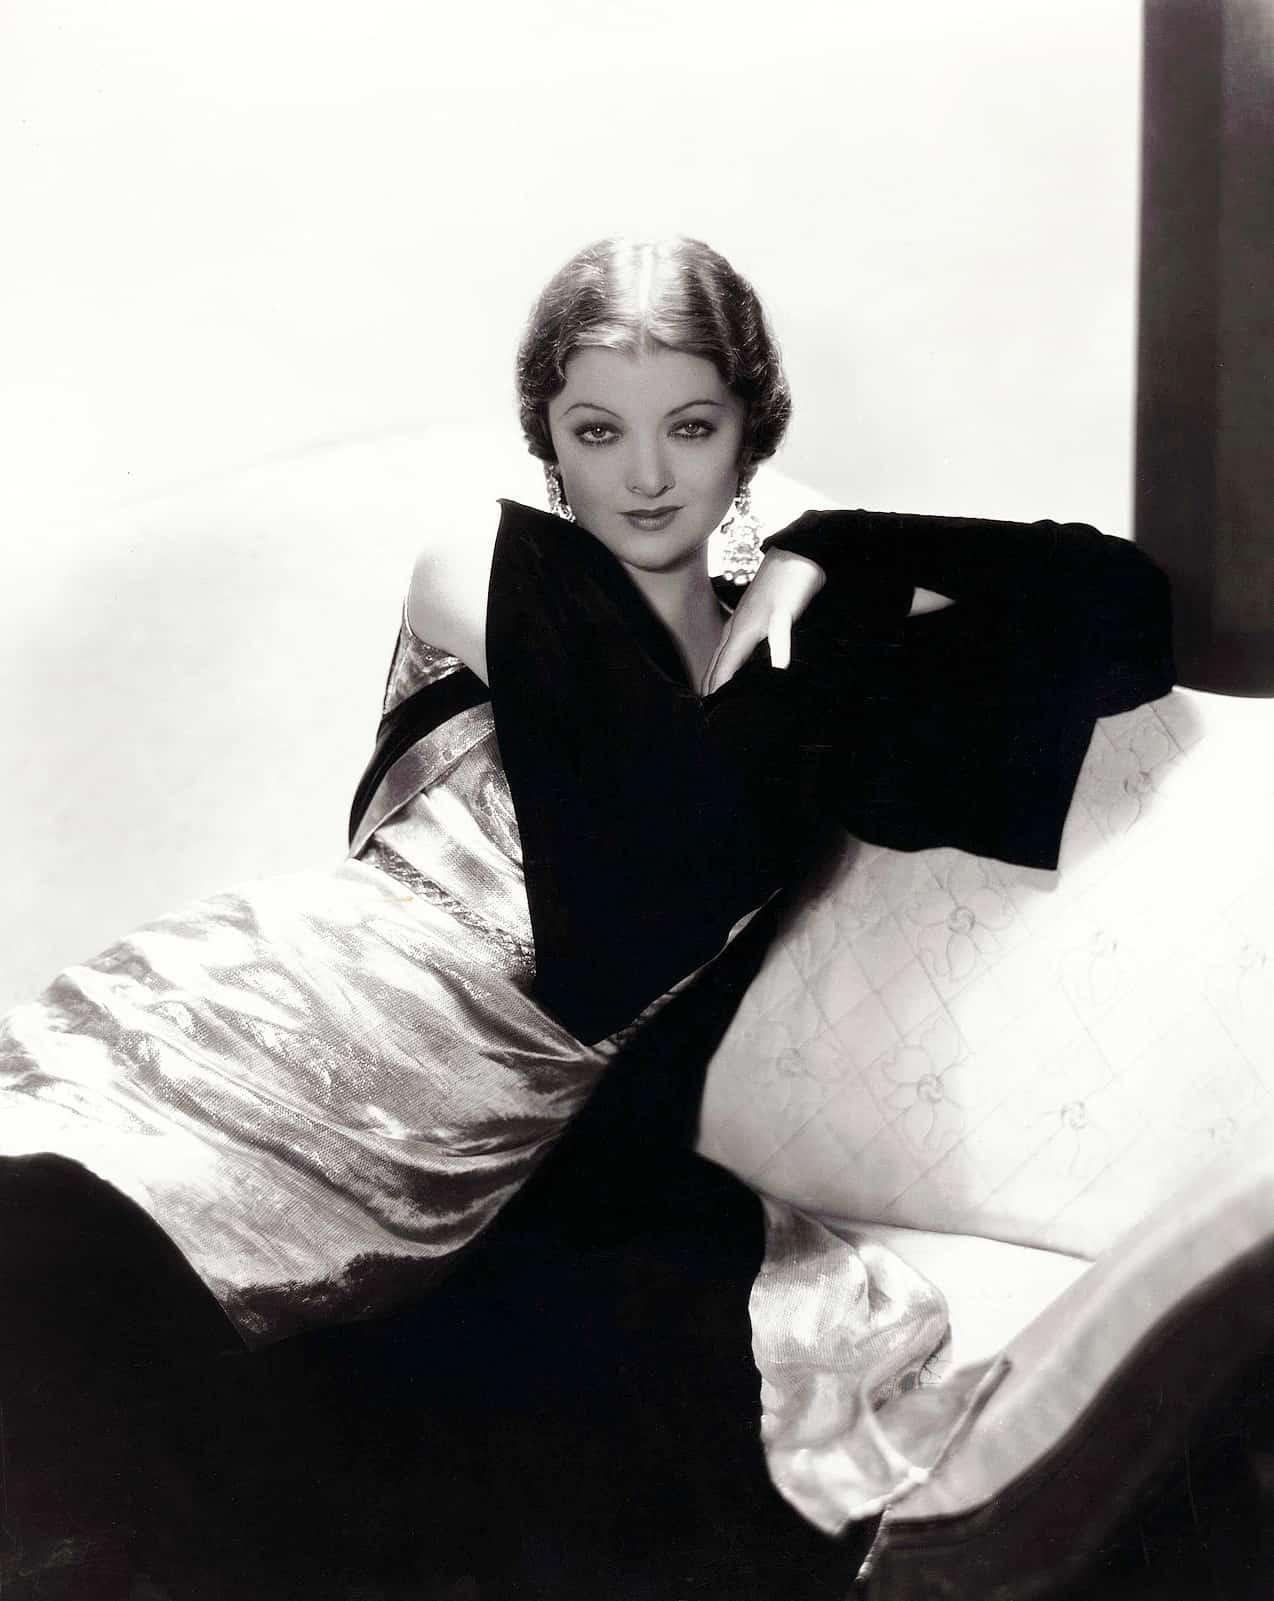 Myrna Loy, 1932. Paramount Pictures publicity still